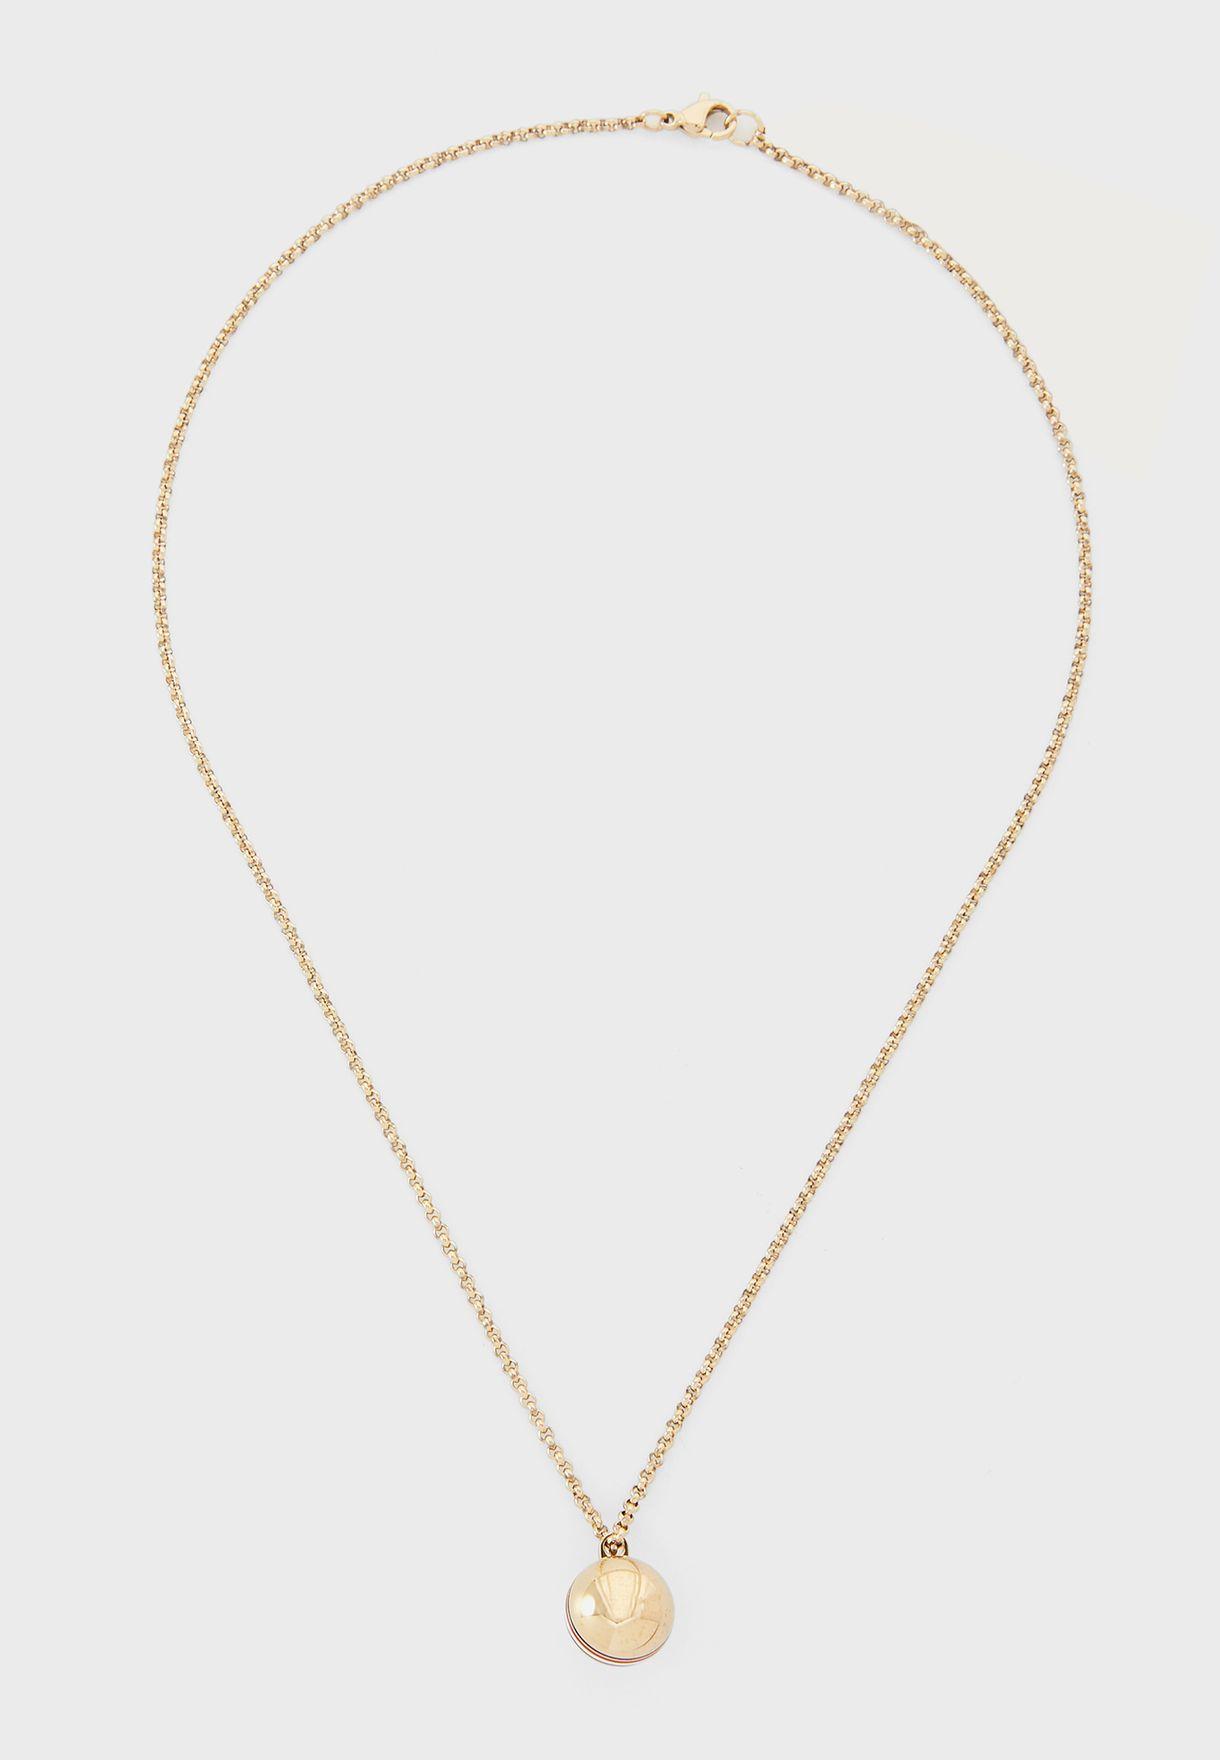 Orb Pendant Necklace